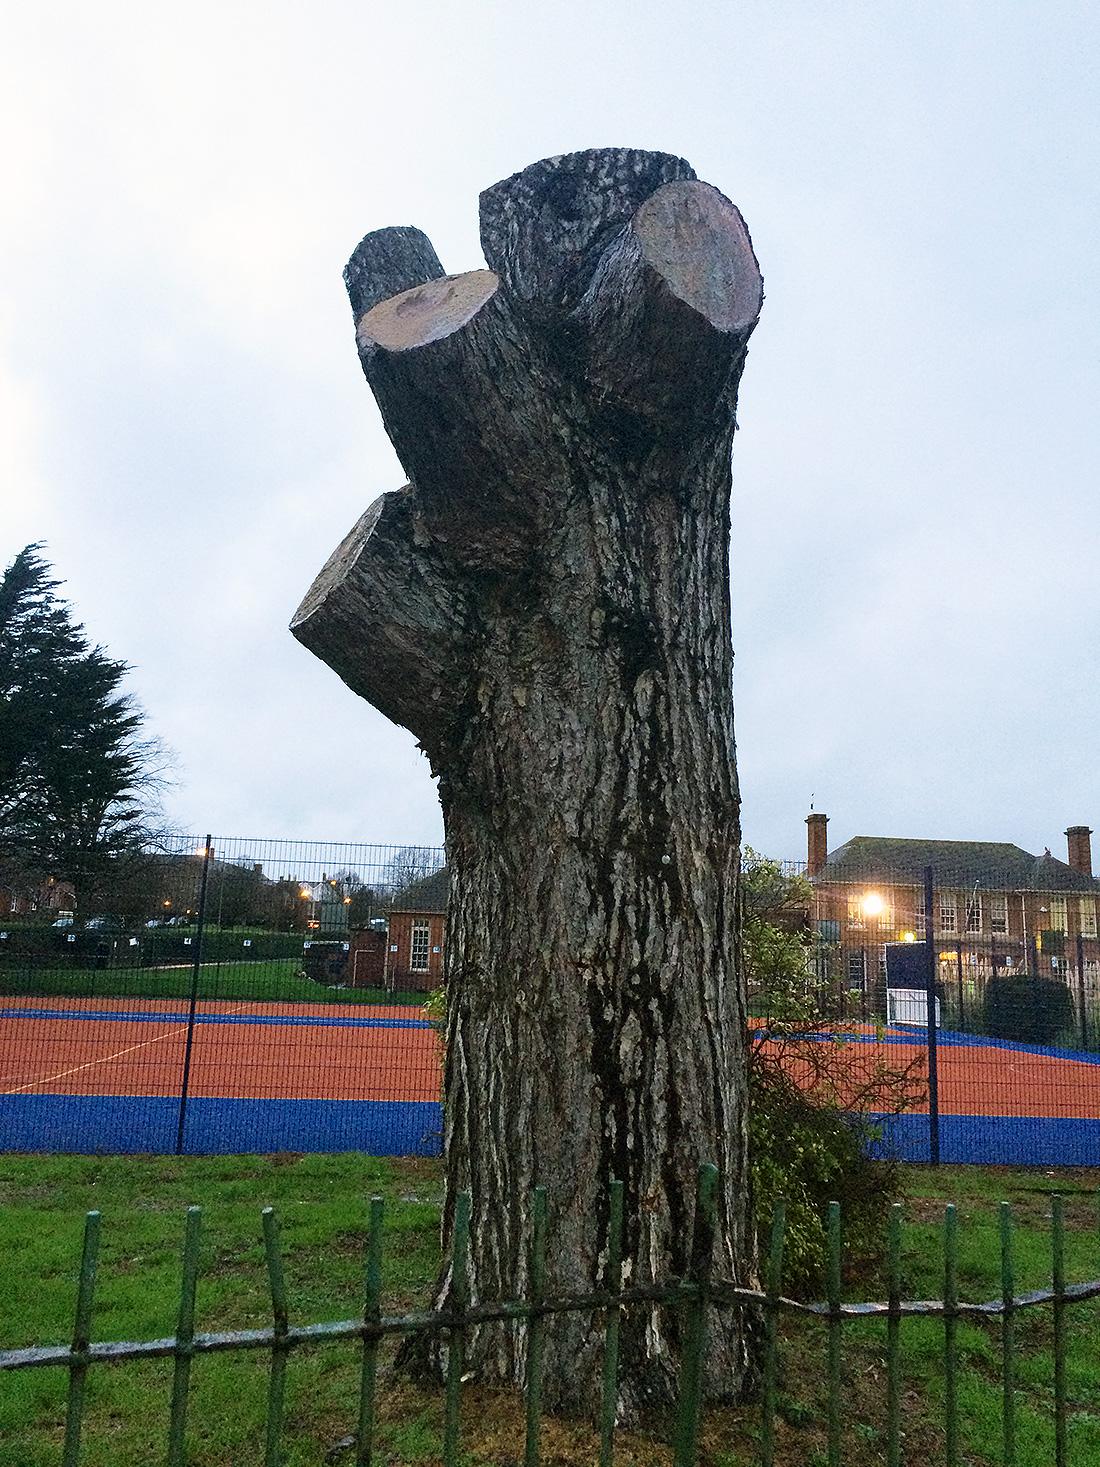 The original tree stump